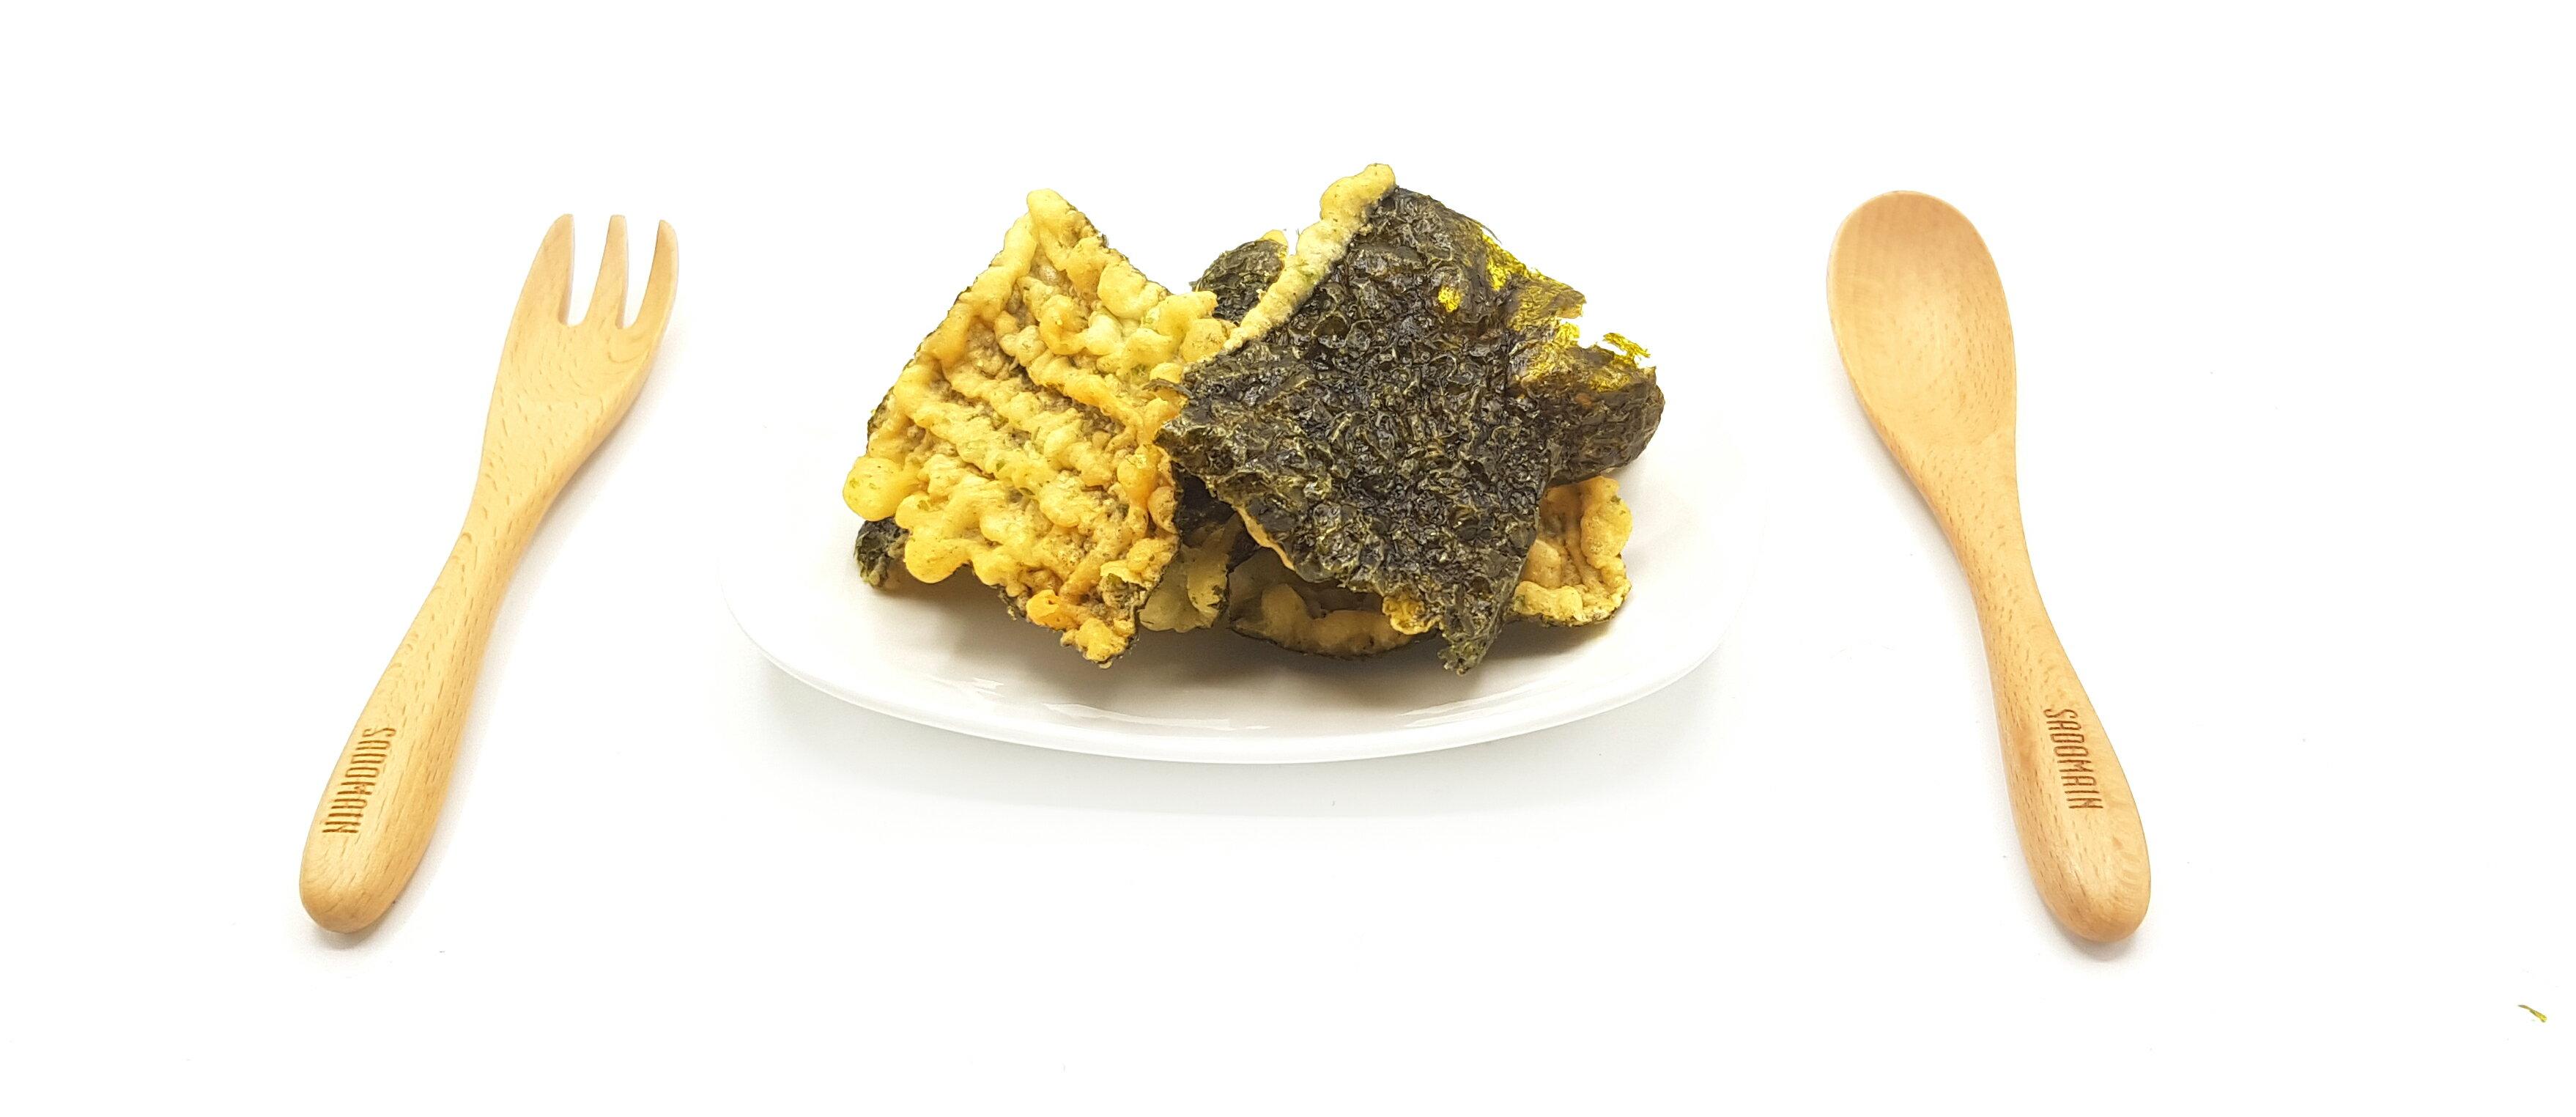 《Chara 微百貨》日本 井上 瀨戶 Maruka 海苔 天婦羅 餅乾 丸嘉 原味 150g  /  上野 芥末口味 炸物 2